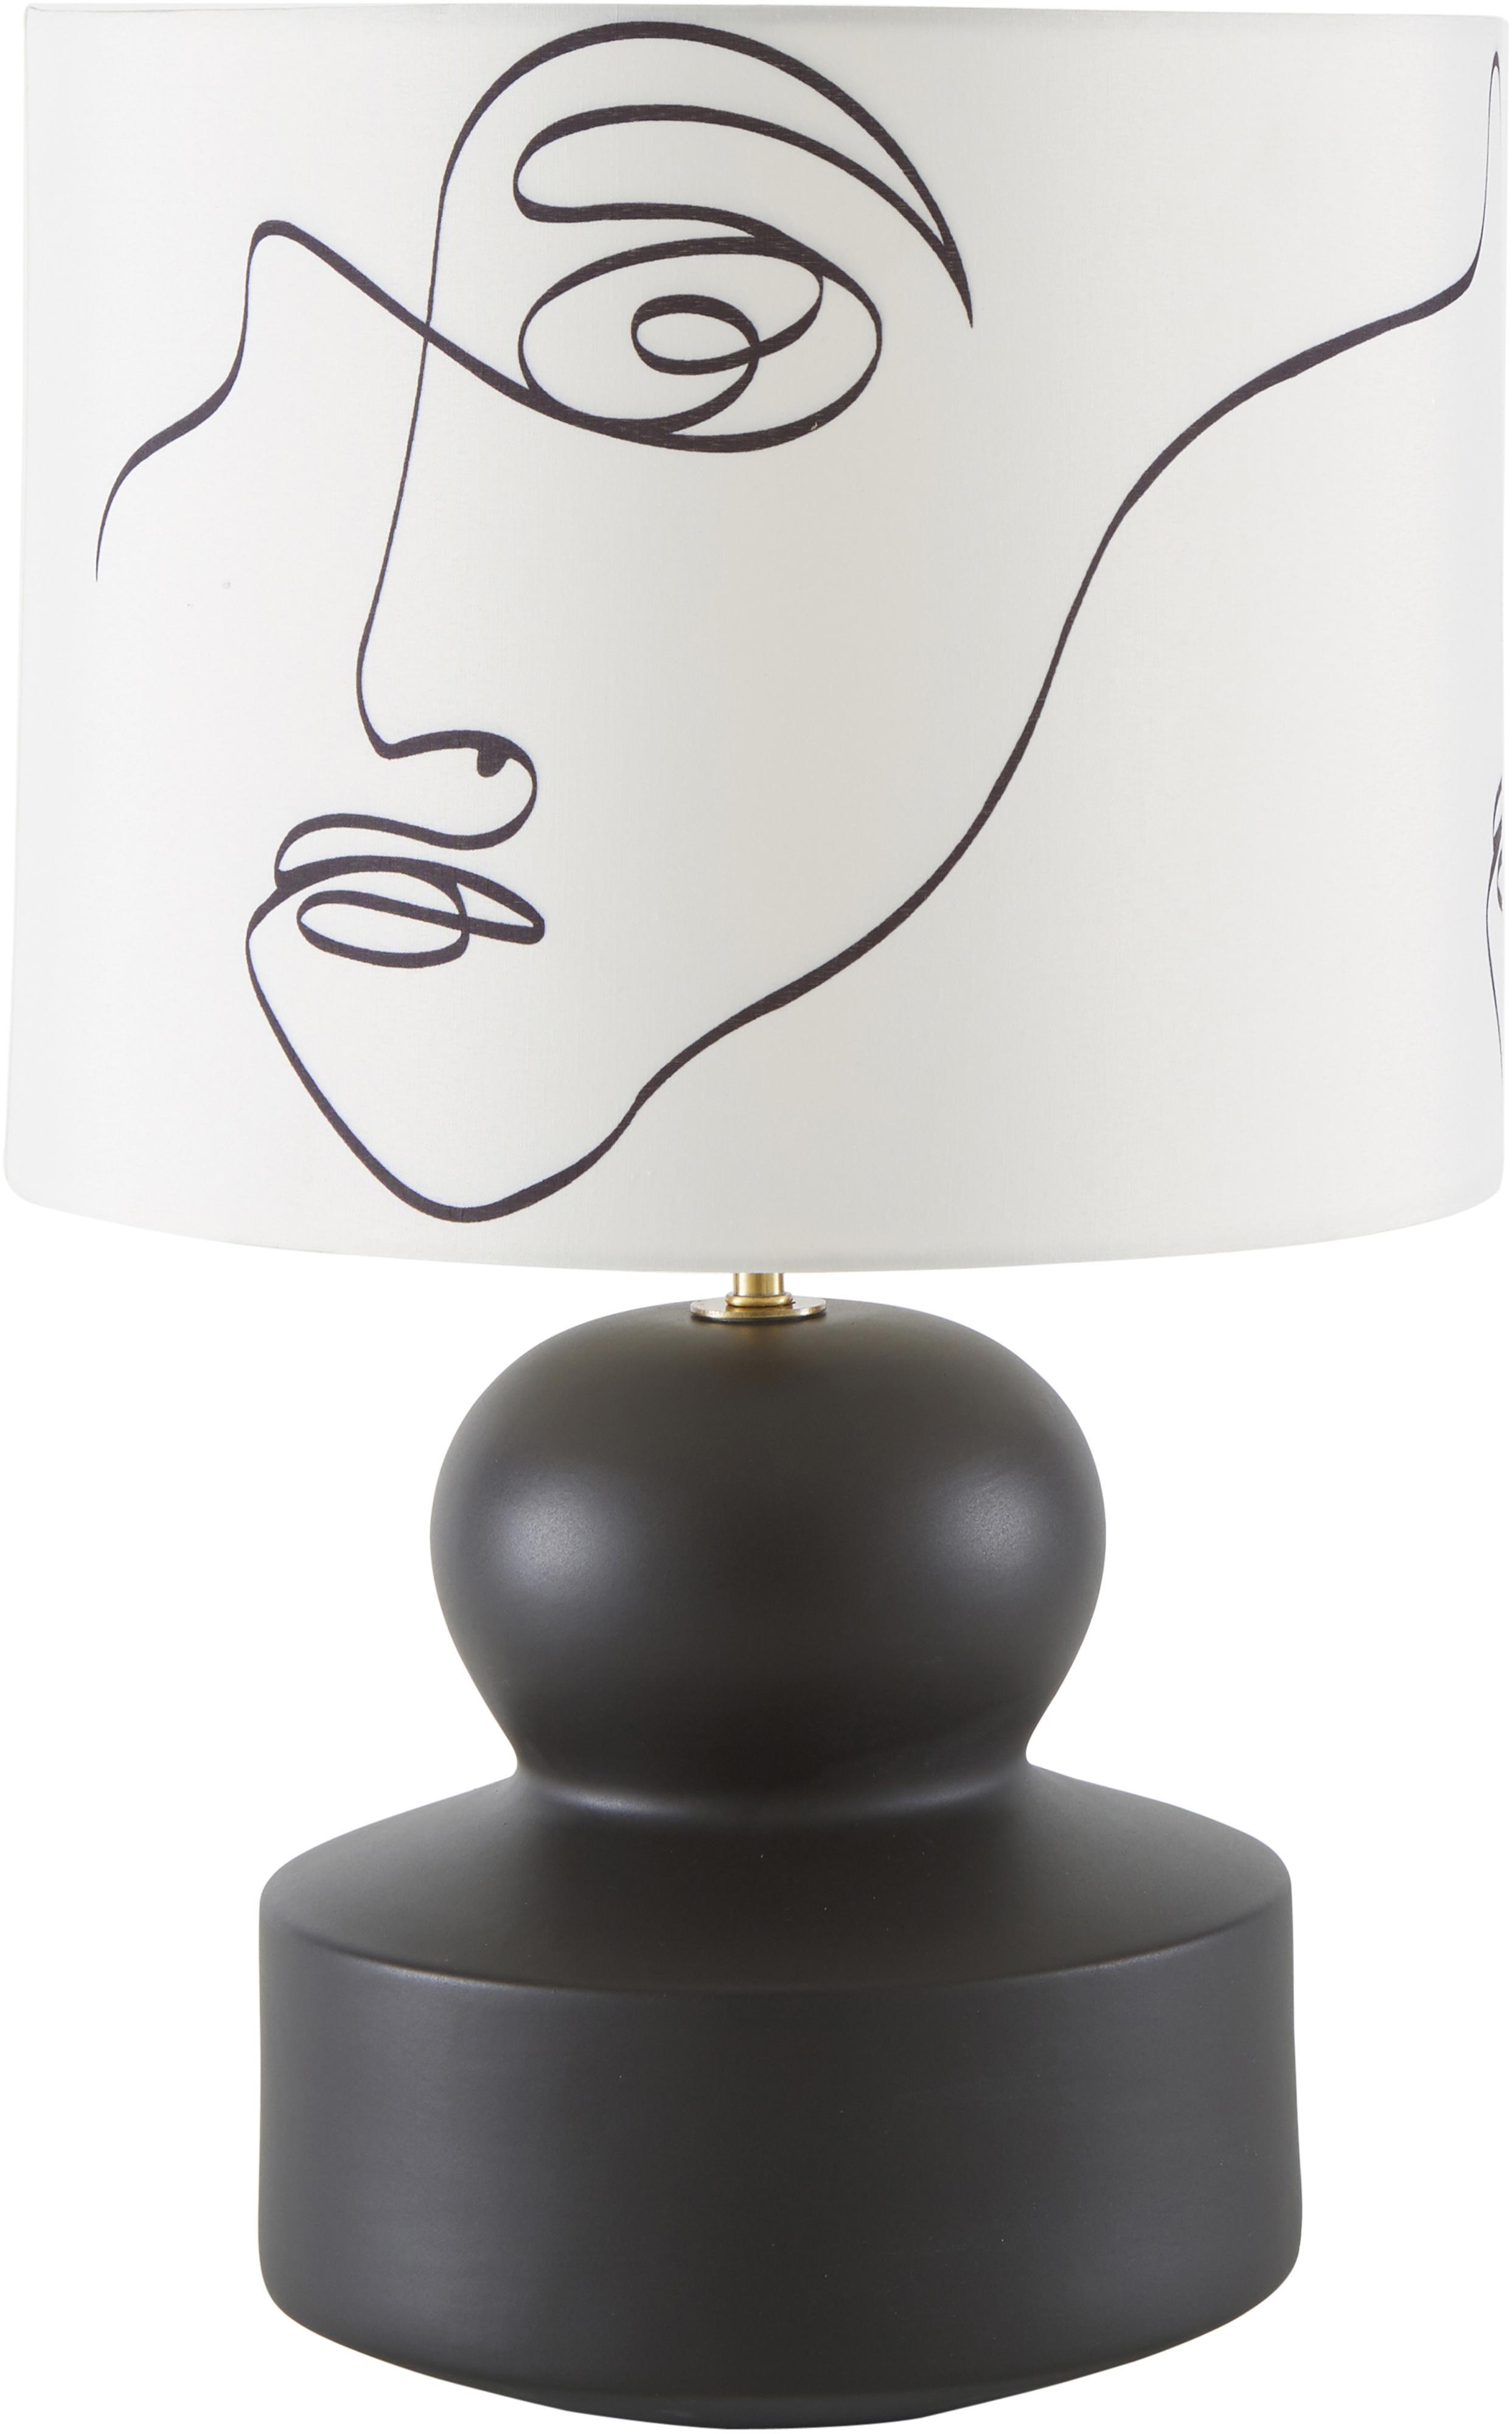 Keramik-Tischlampe Georgina, Lampenschirm: Textil, Lampenfuß: Keramik, Dekor: Metall, vermessingt, Cremeweiß, Schwarz, Ø 33 x H 52 cm